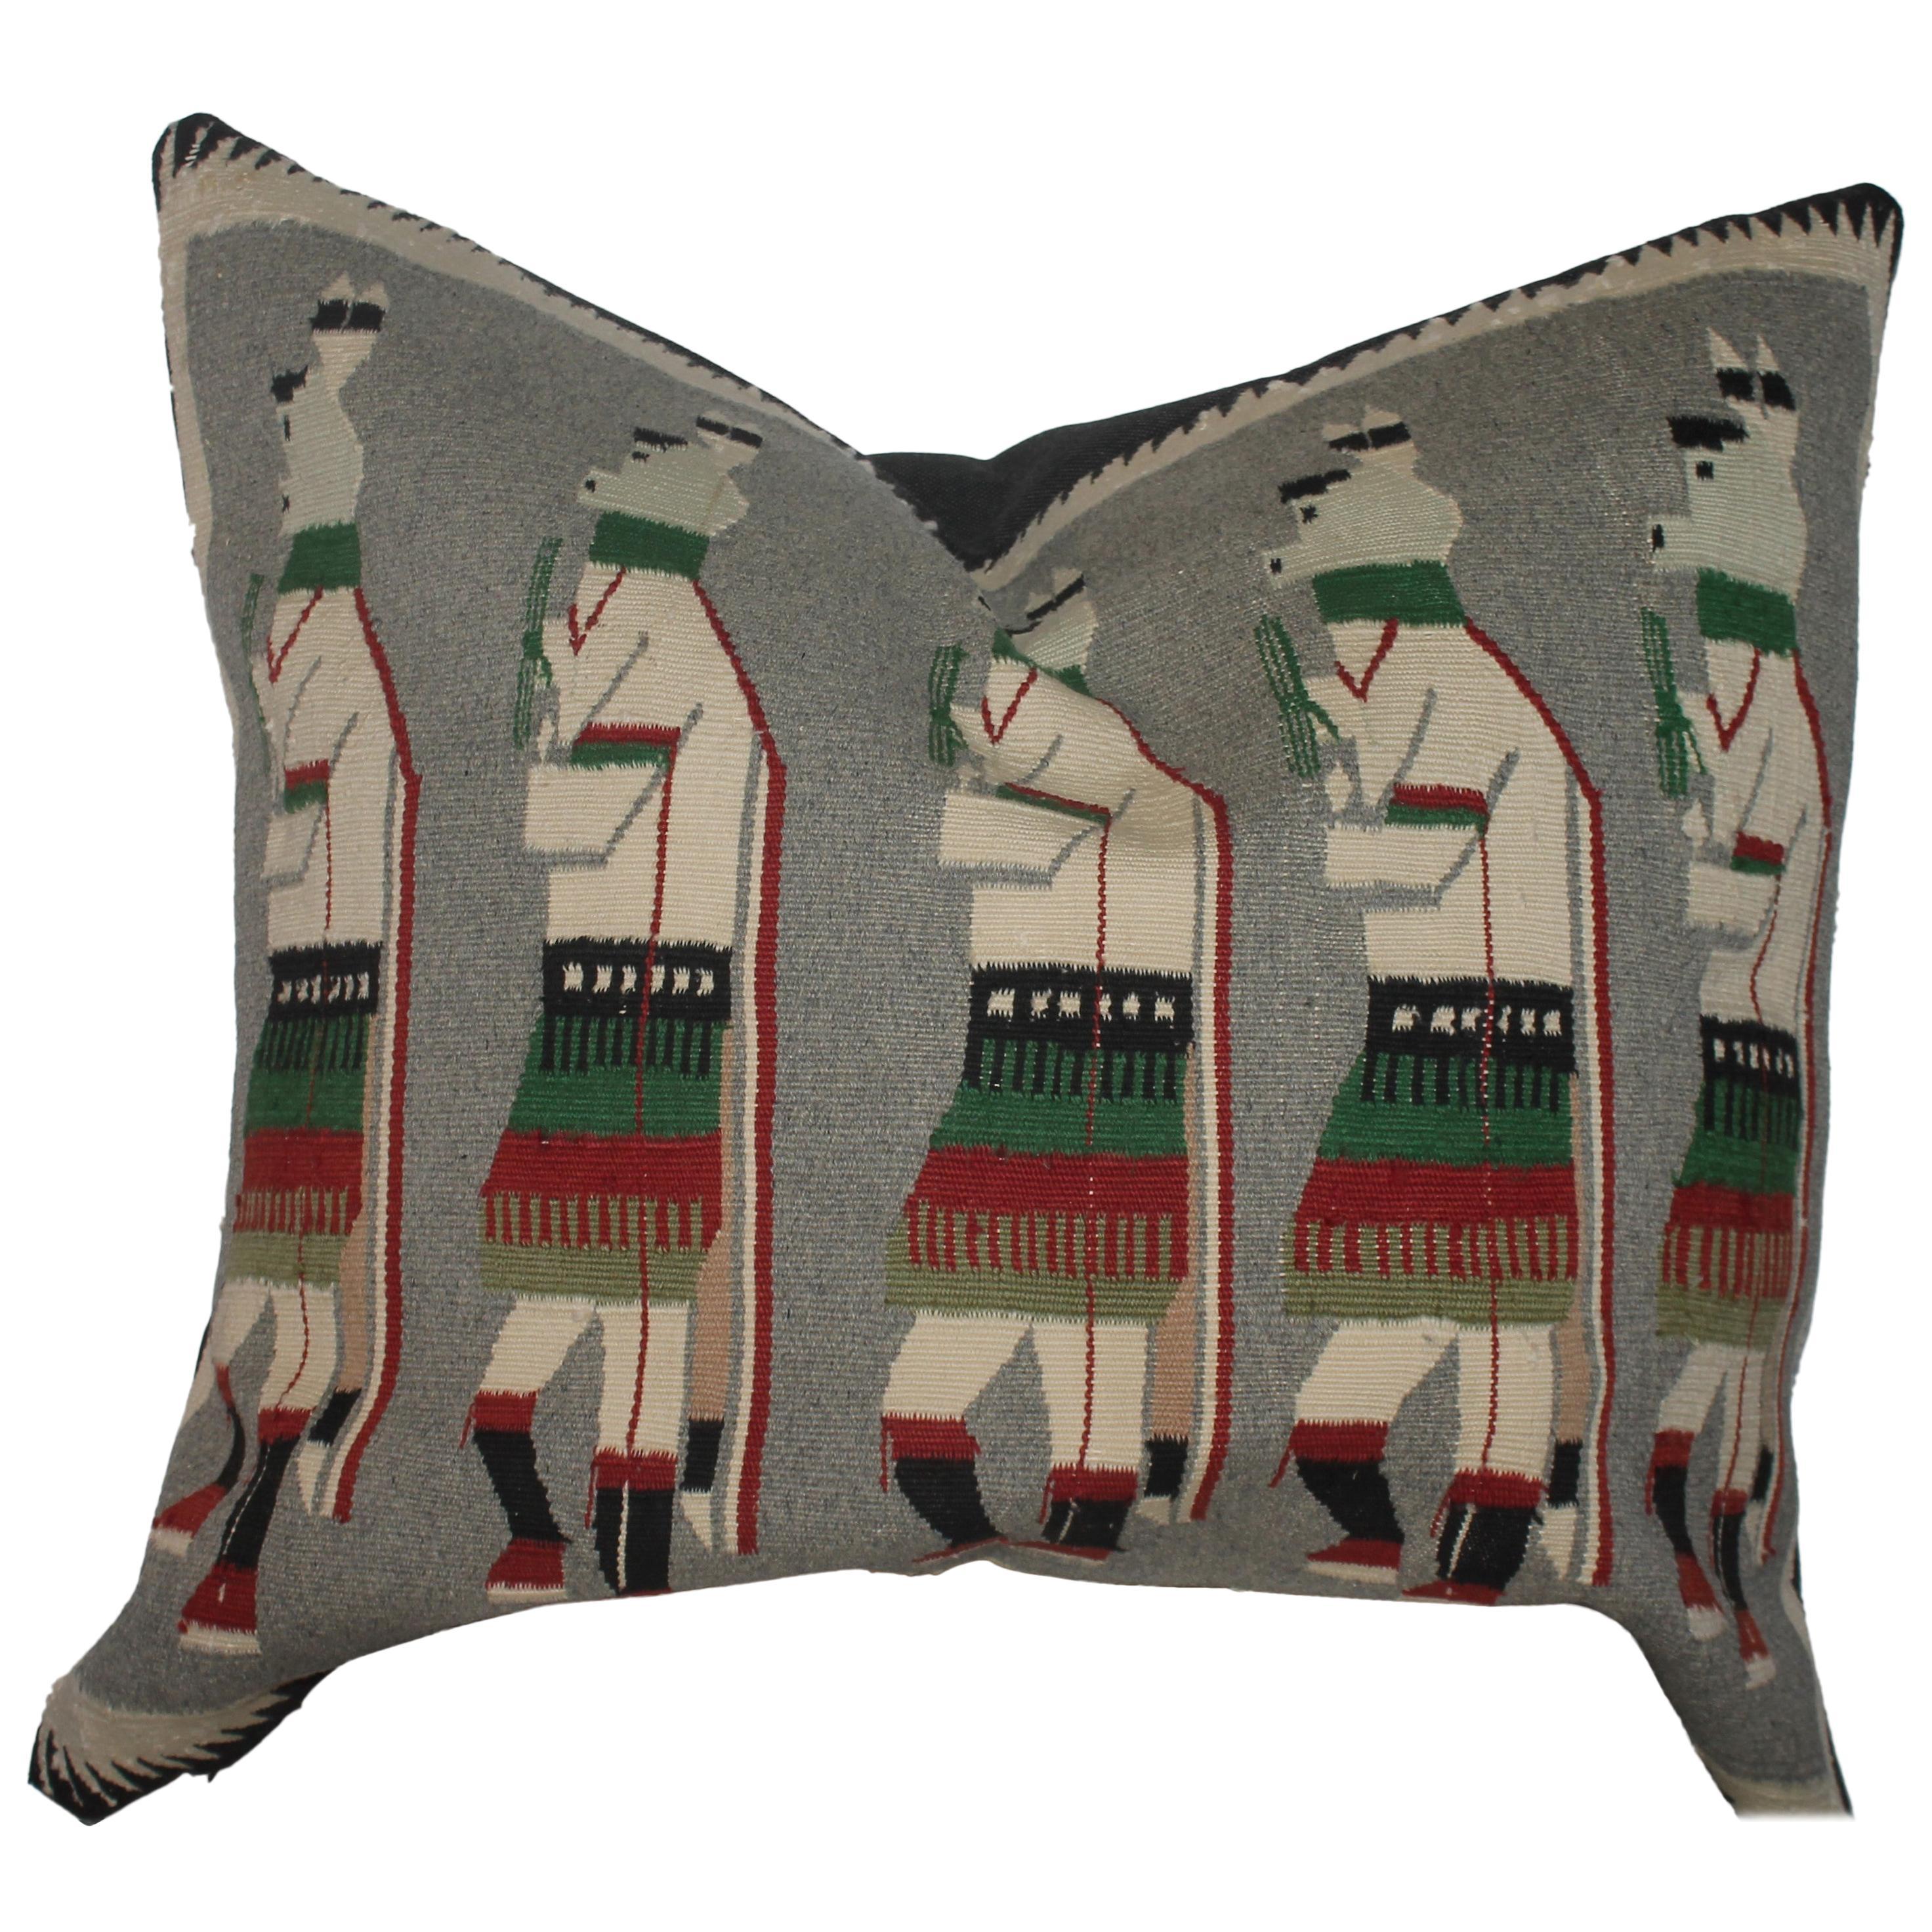 Yeibechei Navajo Indian Weaving Pillow